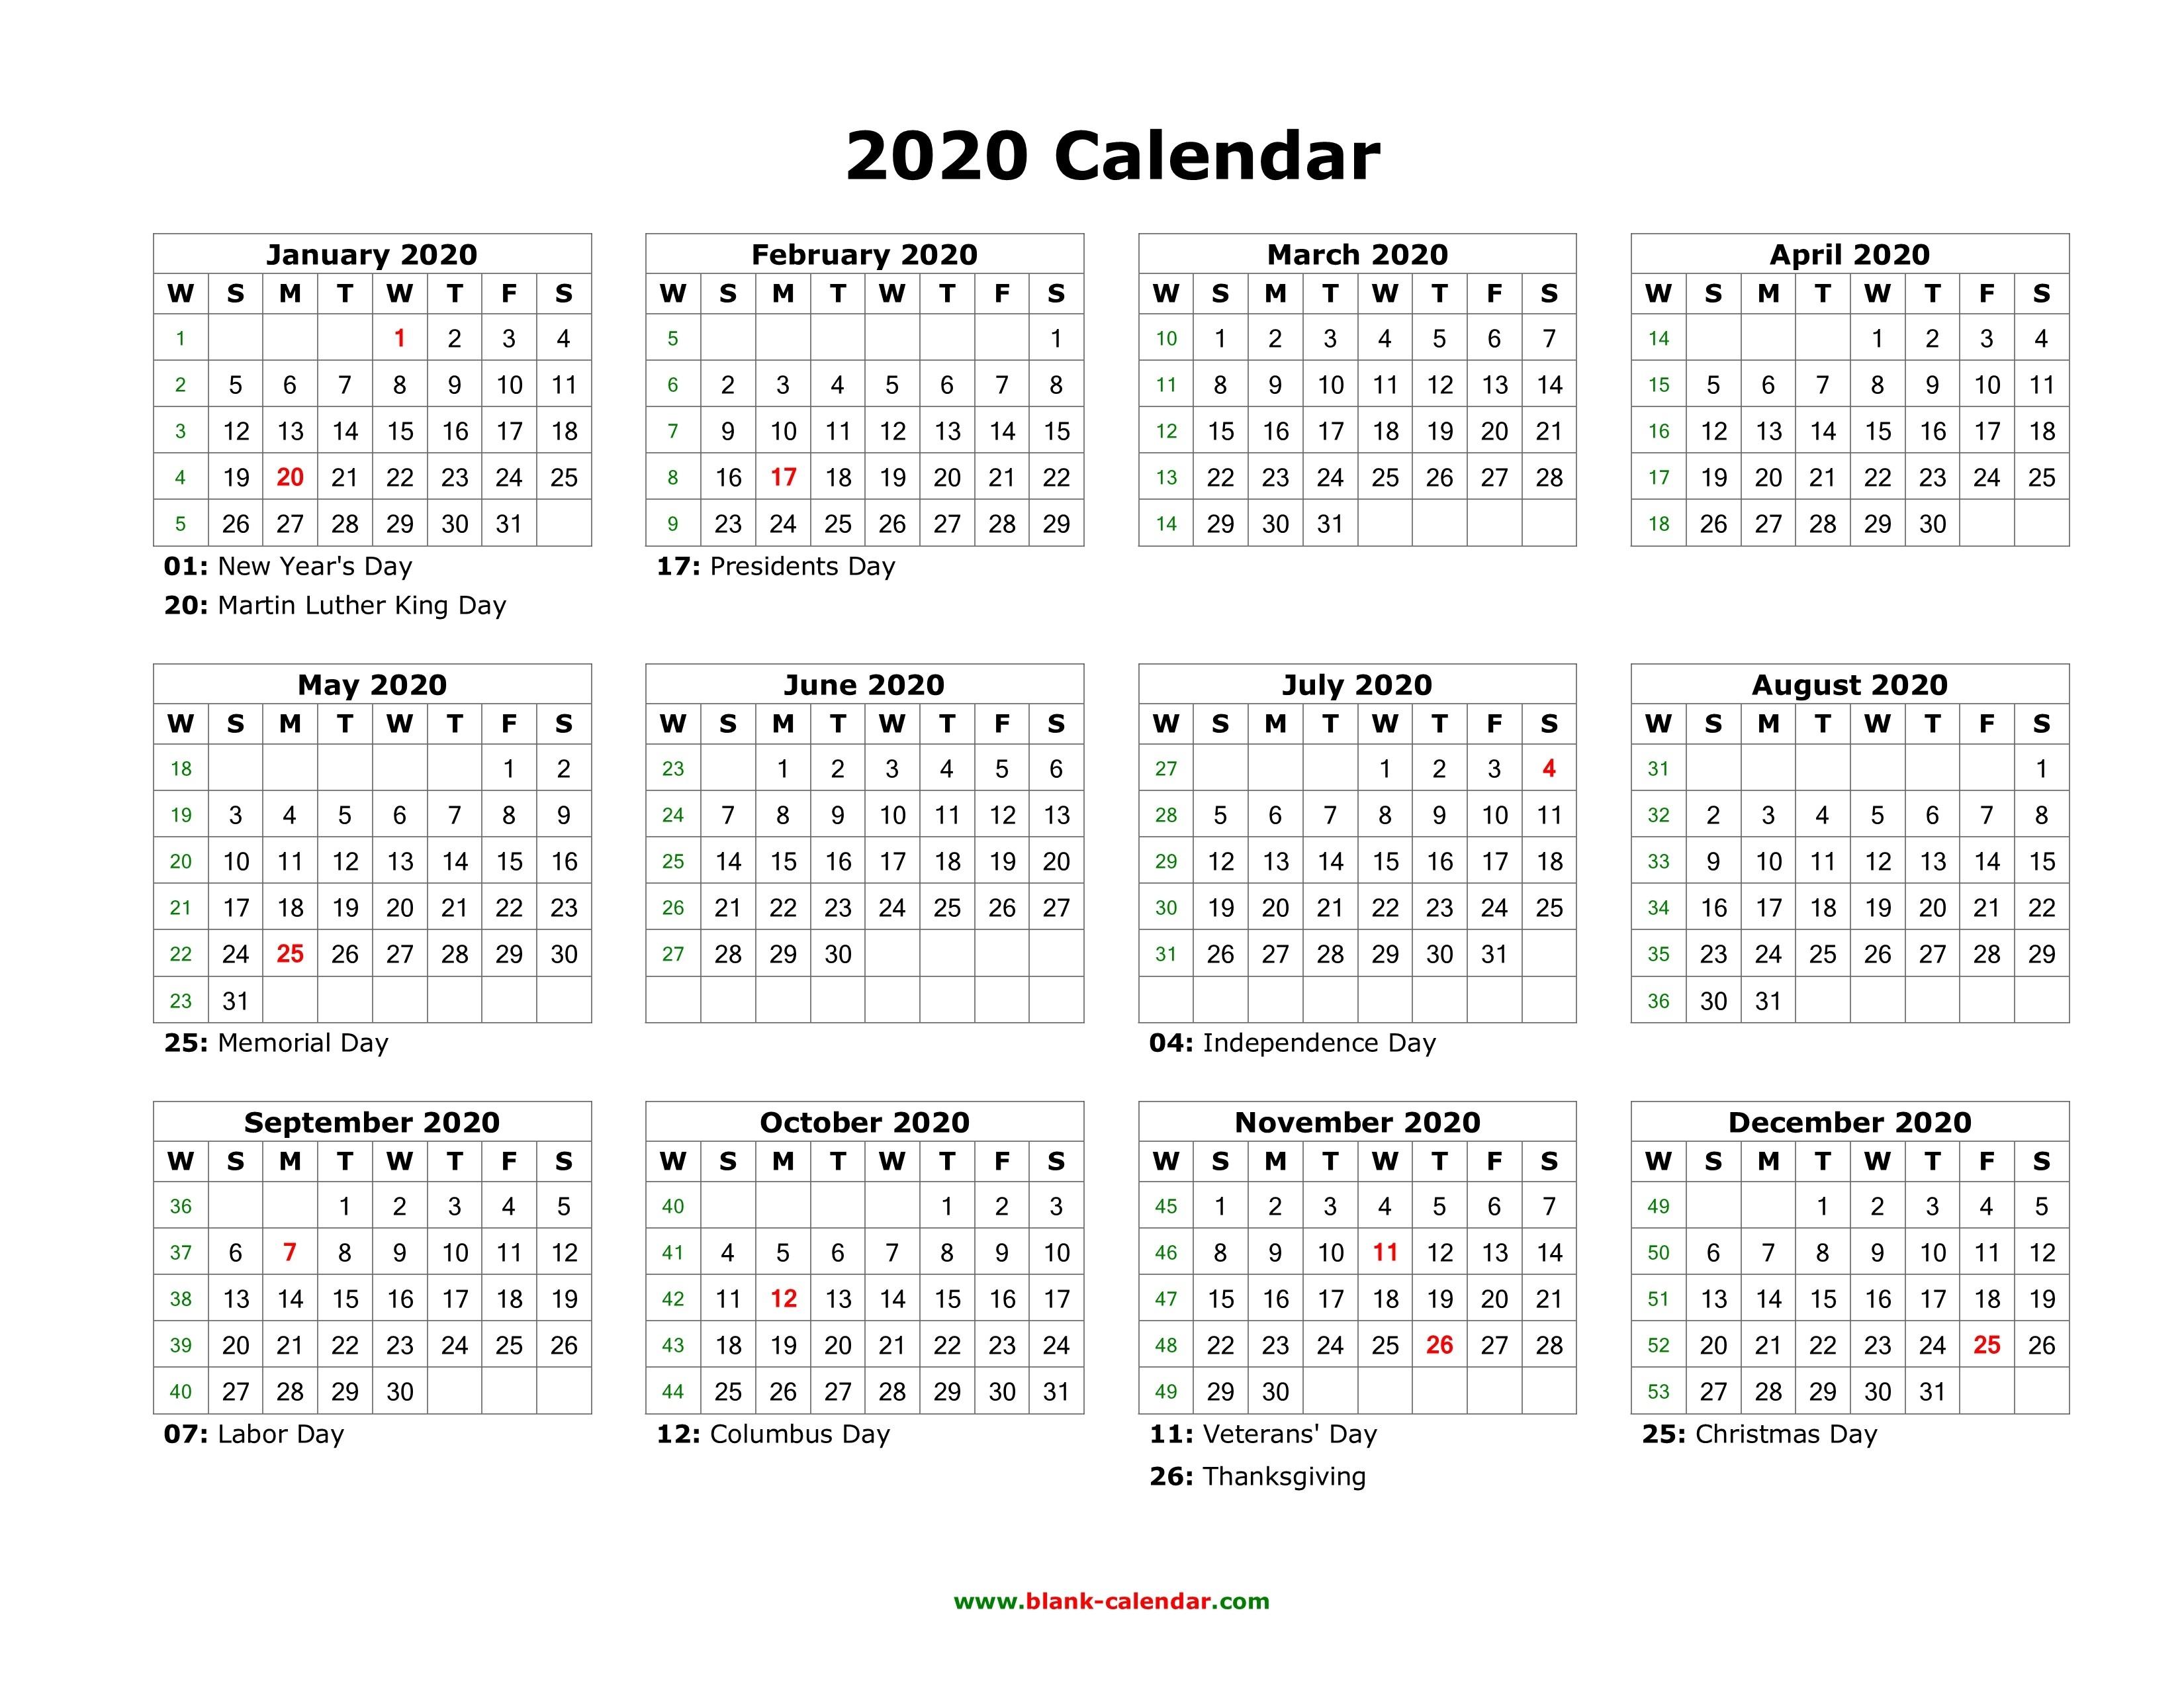 Blank Calendar 2020 | Free Download Calendar Templates-Blank Fill In Calendars 2020 Printable